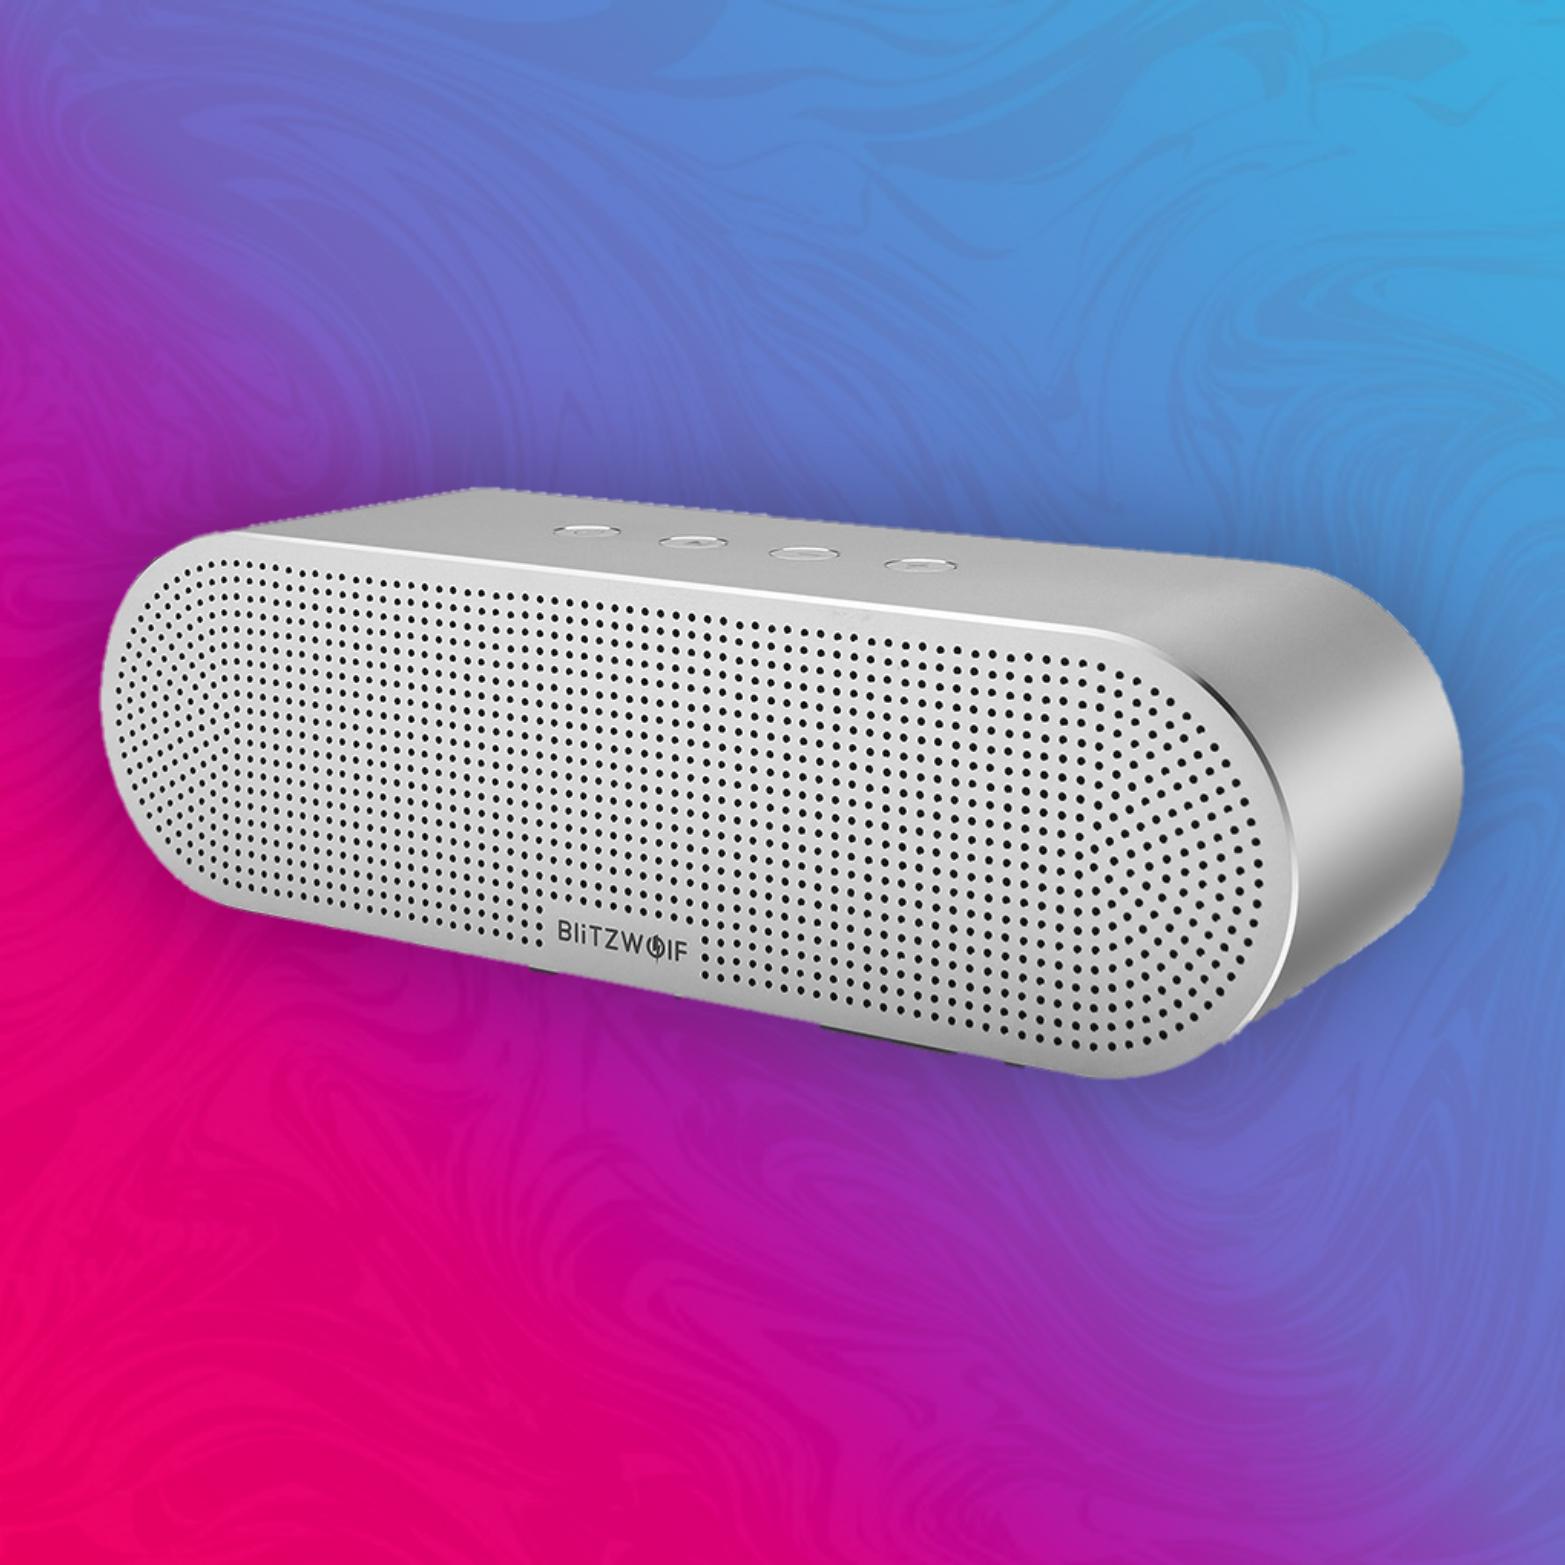 BlitzWolf BW-AS1 - Bluetooth Lautsprecher - 20 Watt - 5200mAh - Aluminiumgehäuse